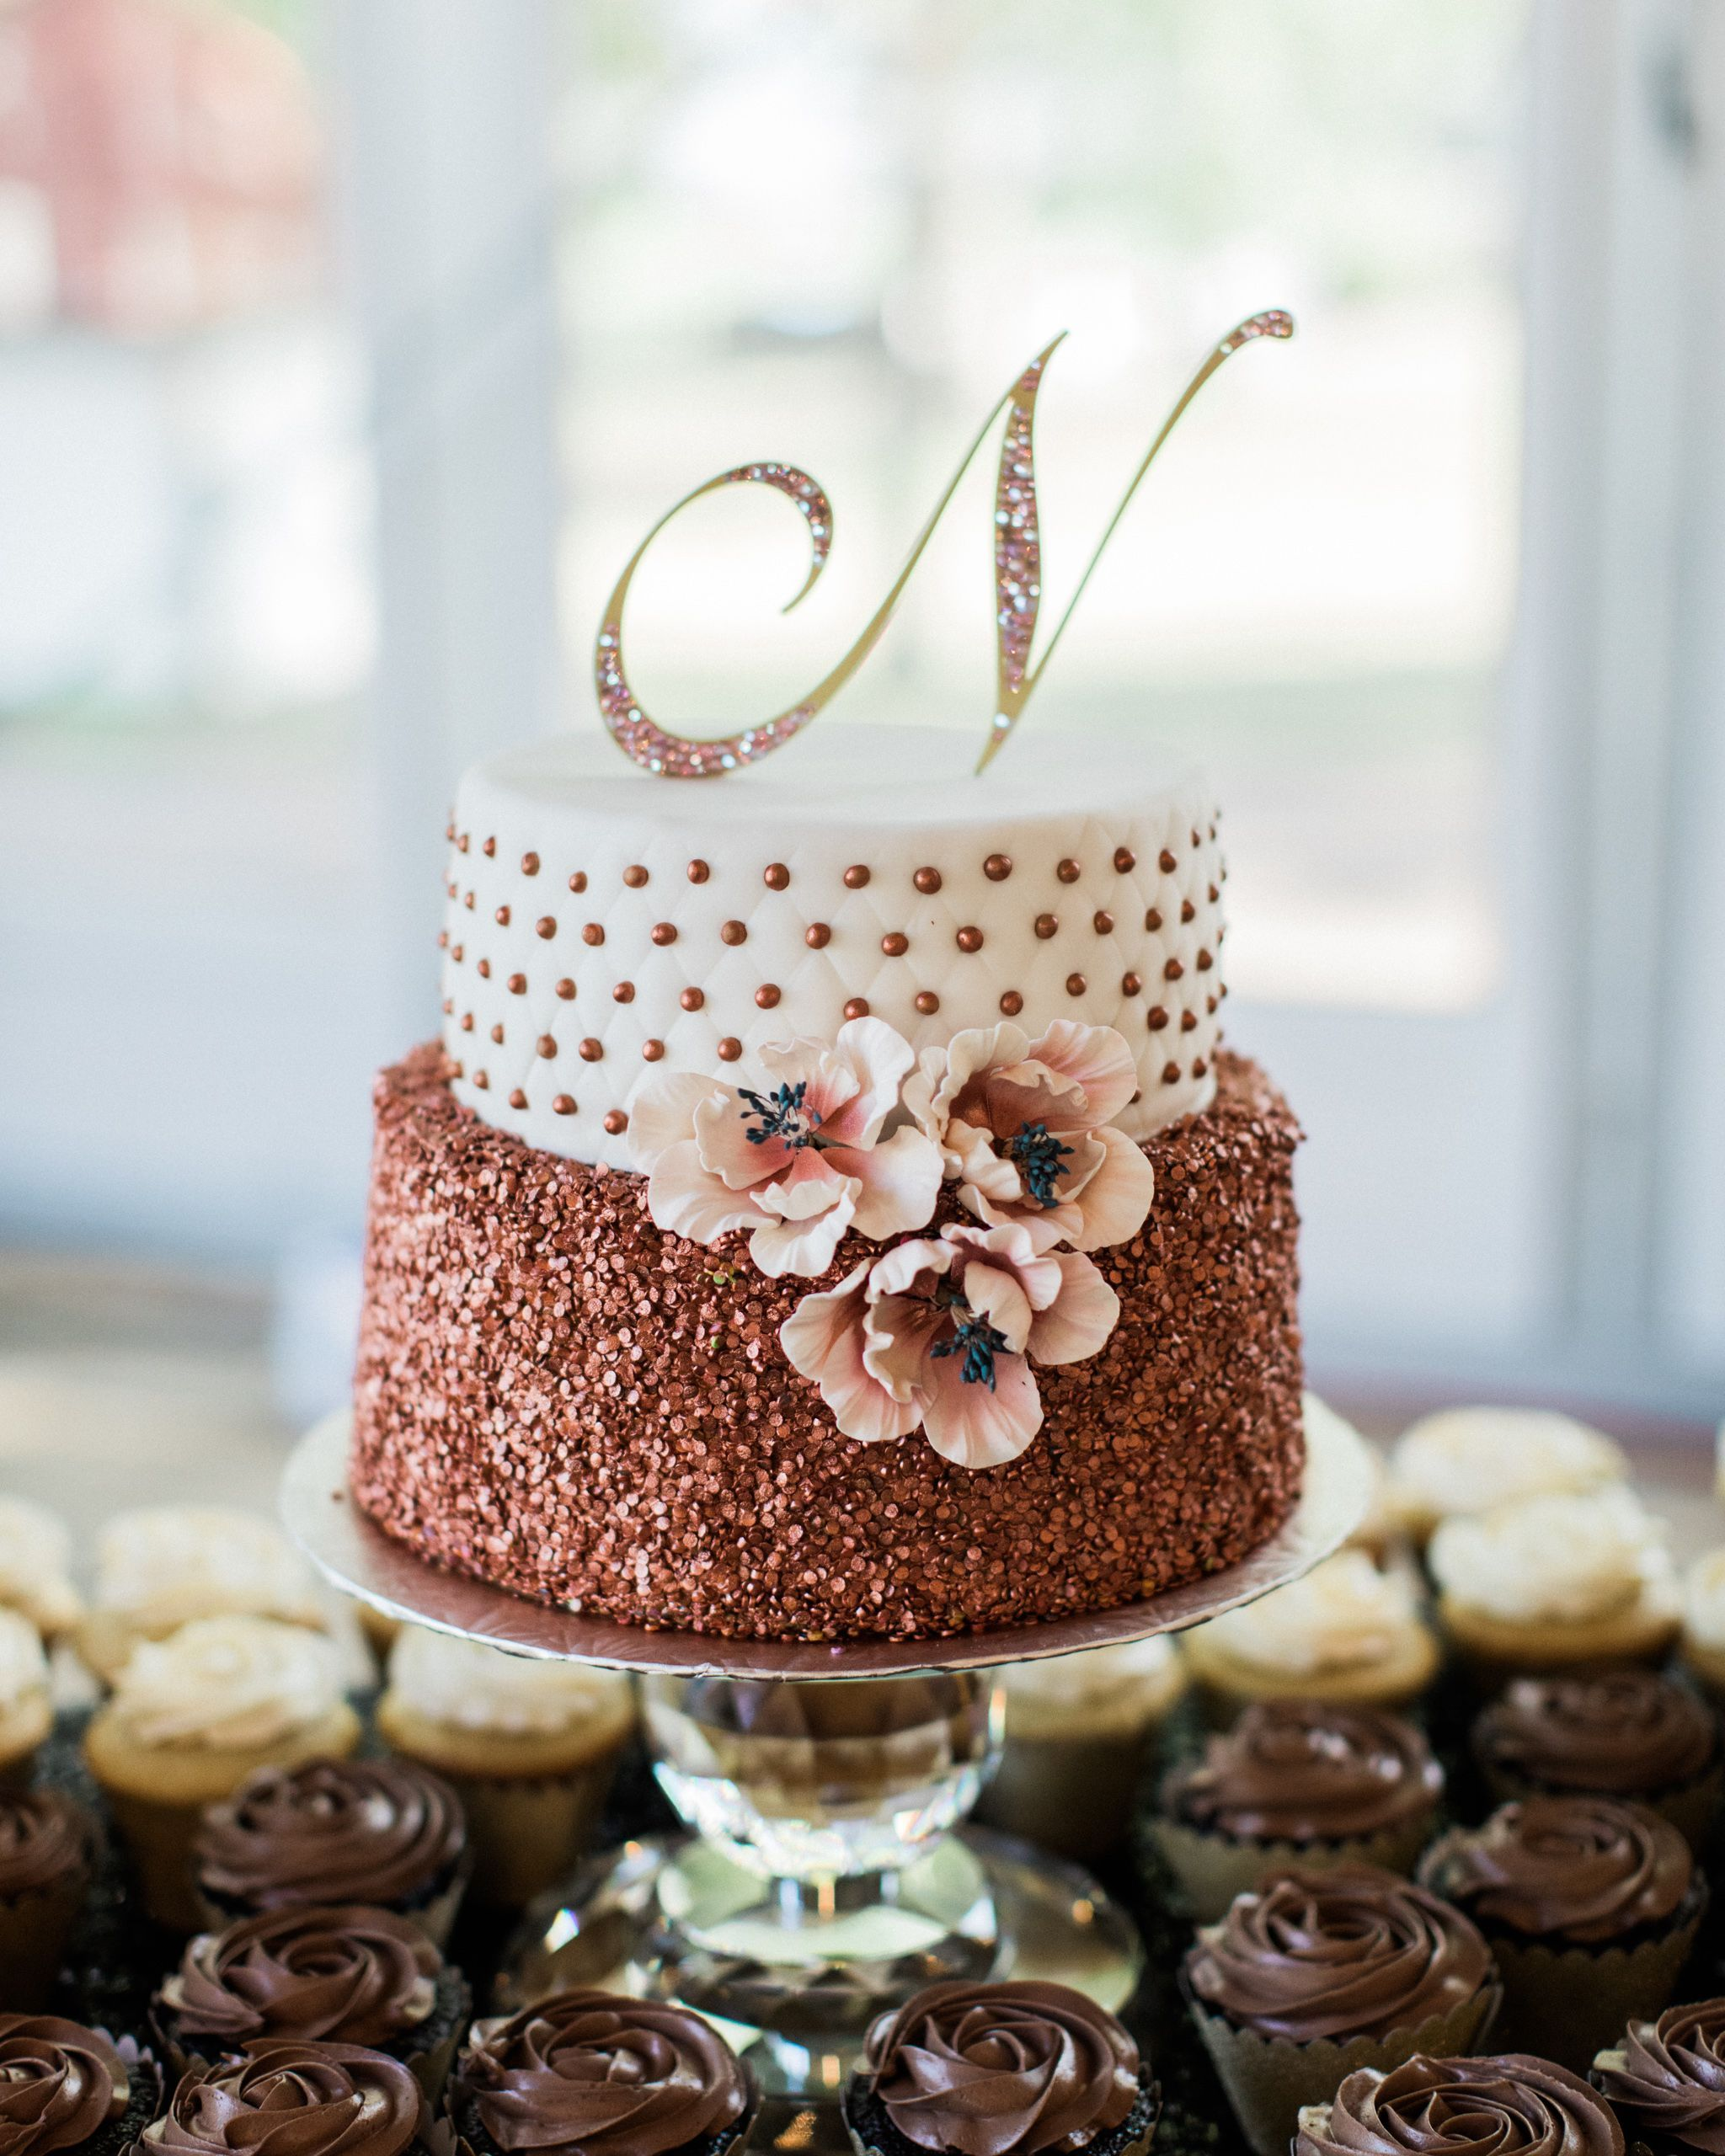 9+ Of The Best Homemade Birthday Cake Ideas